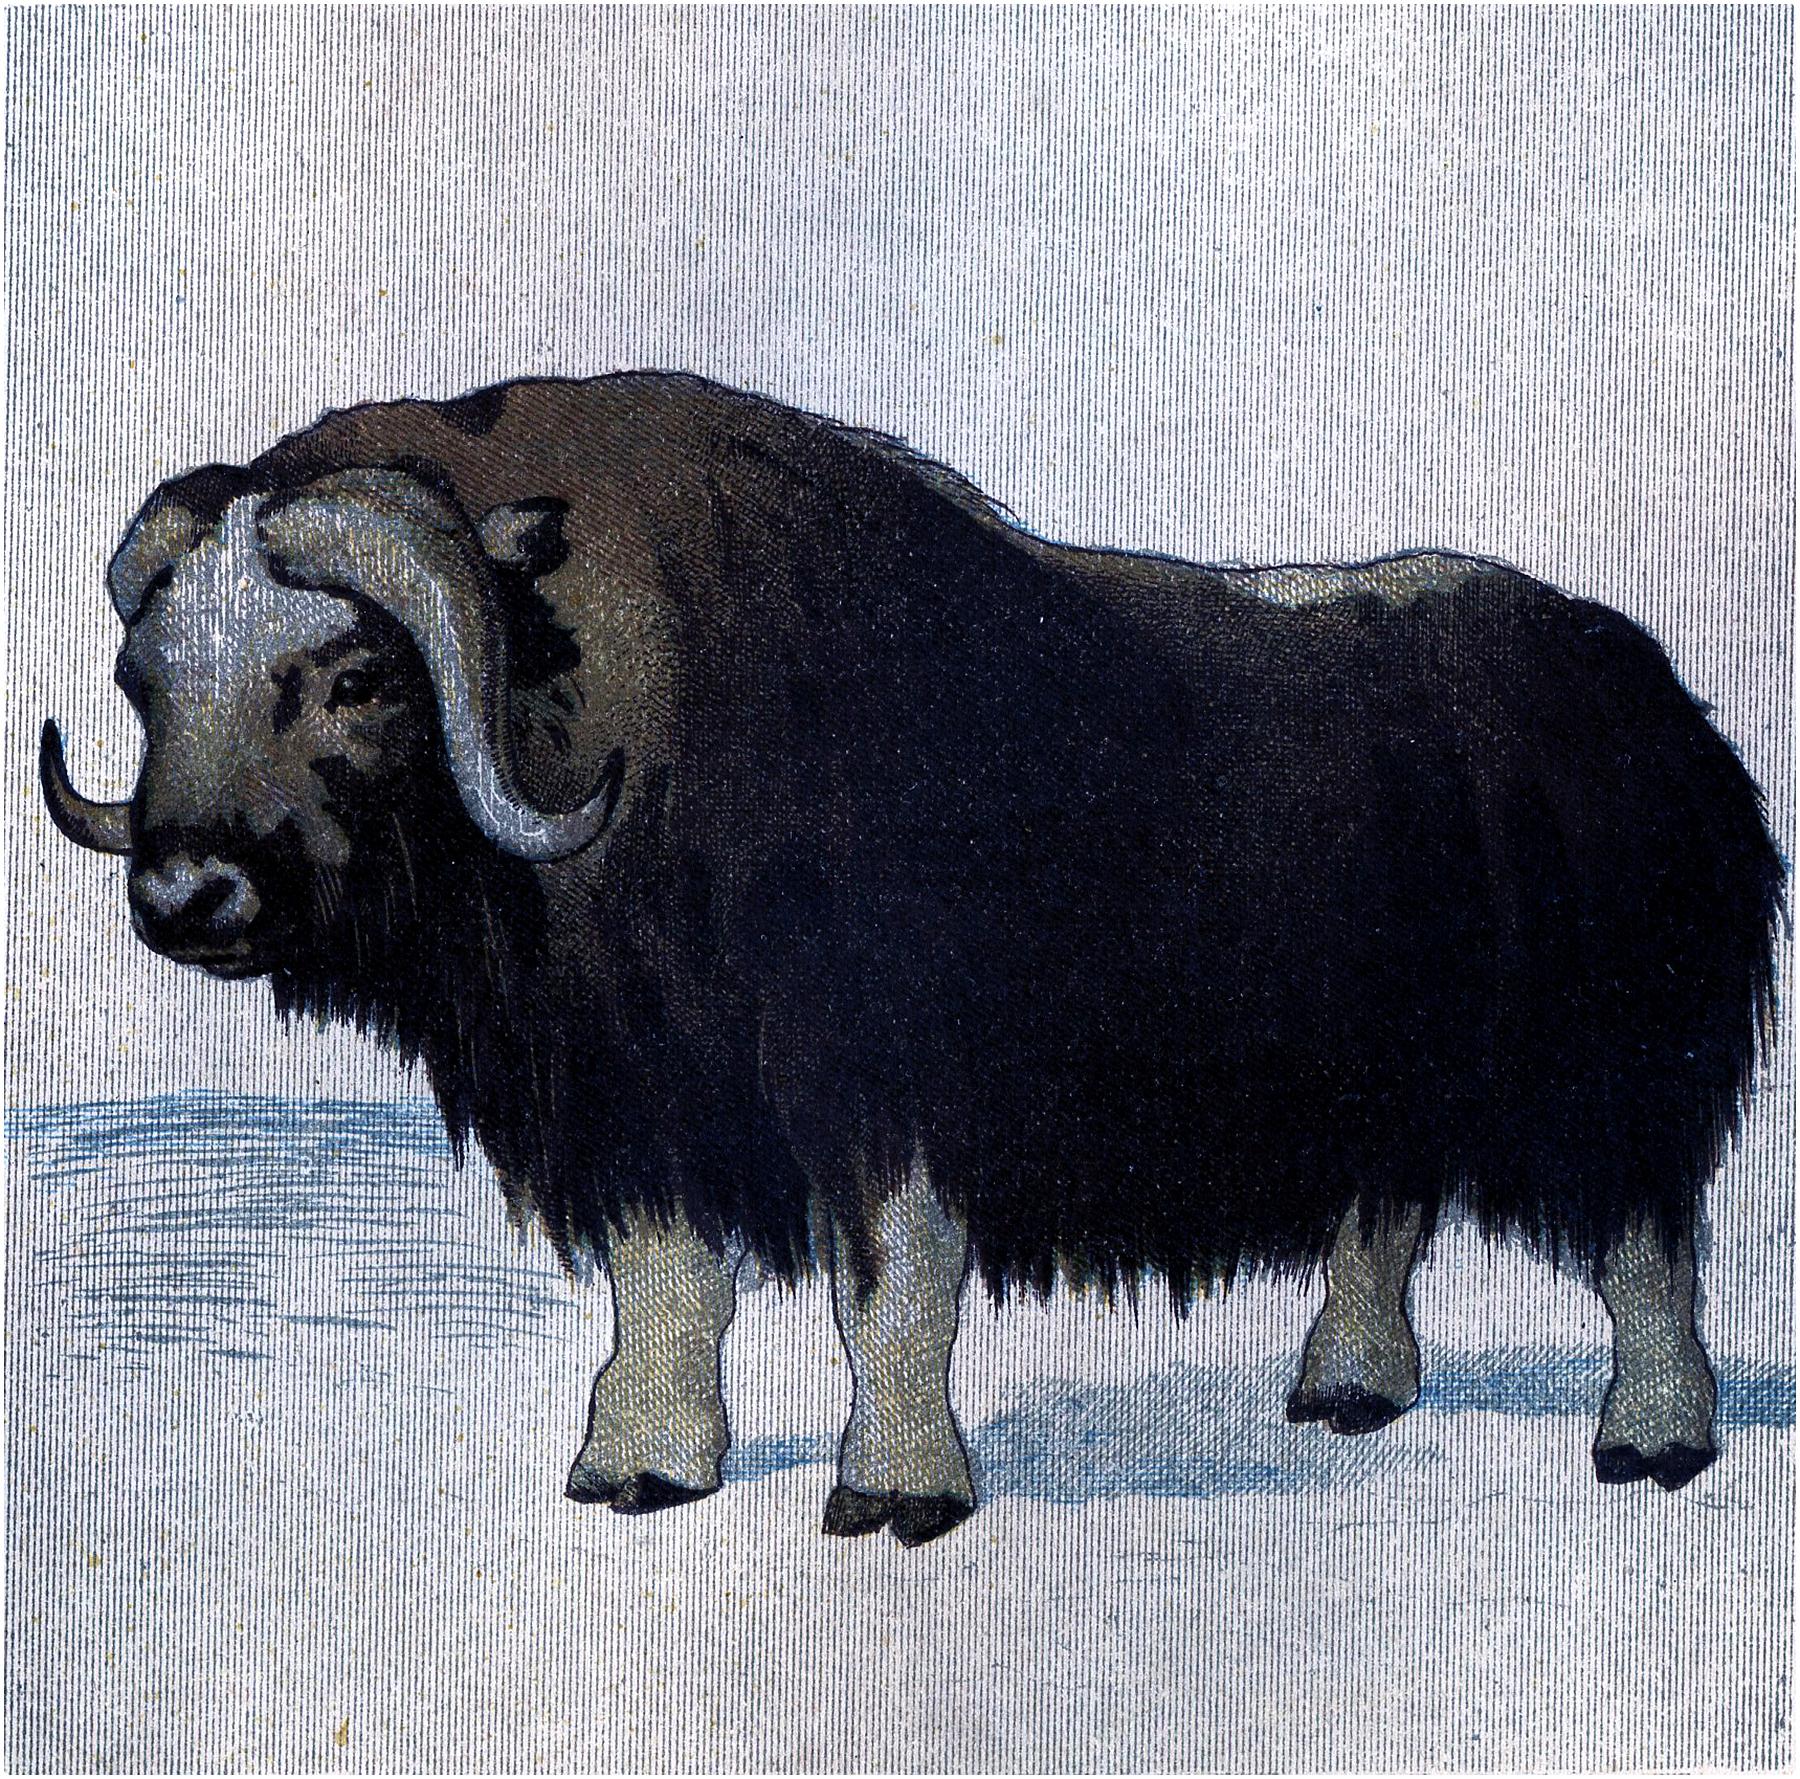 Vintage Musk Ox Image